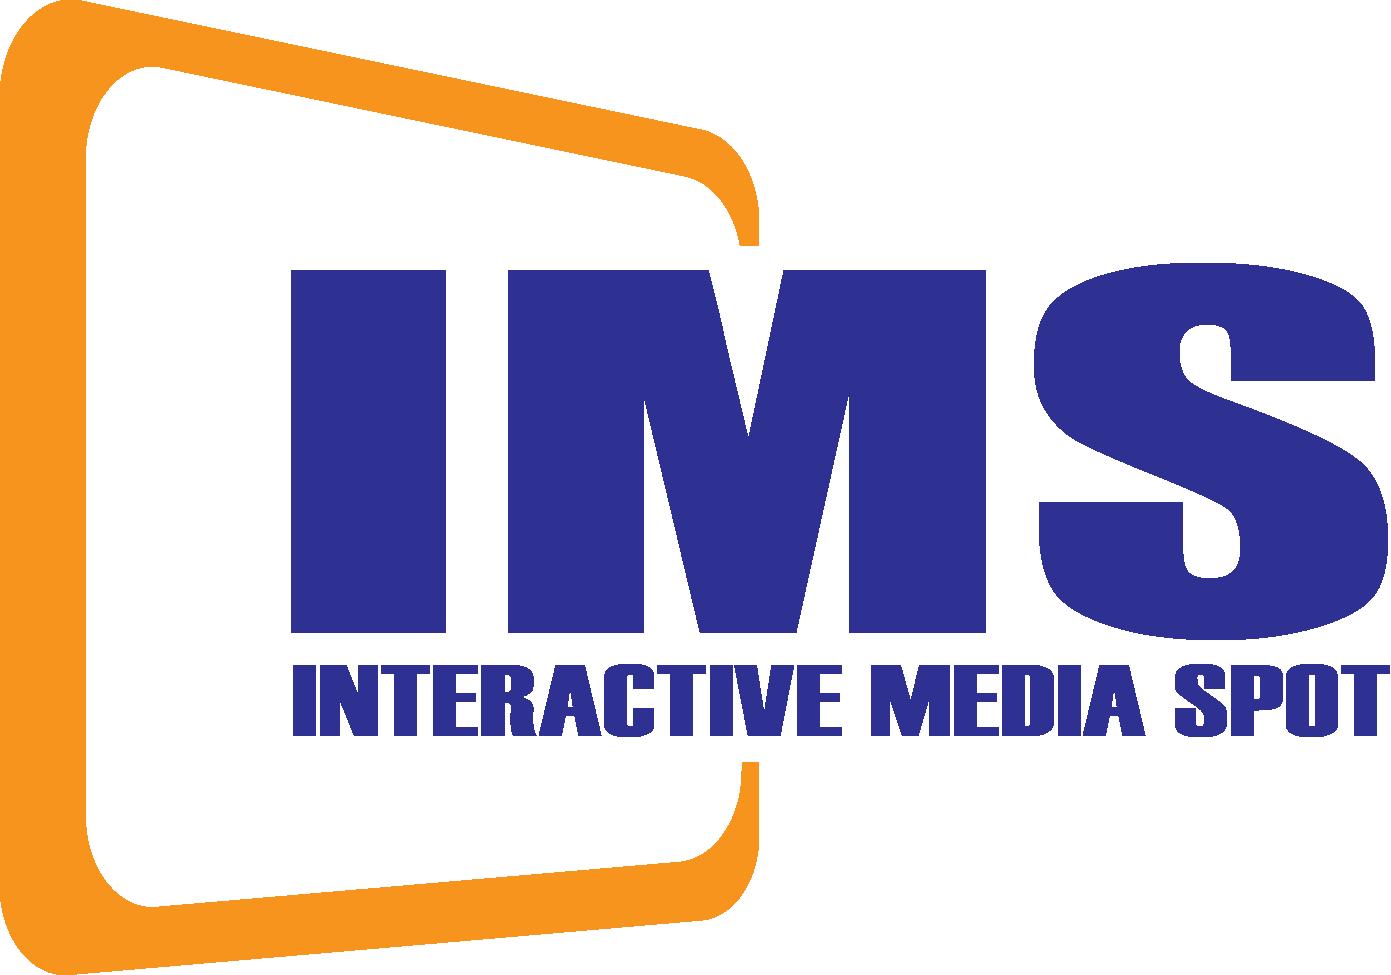 Interactive Media Spot